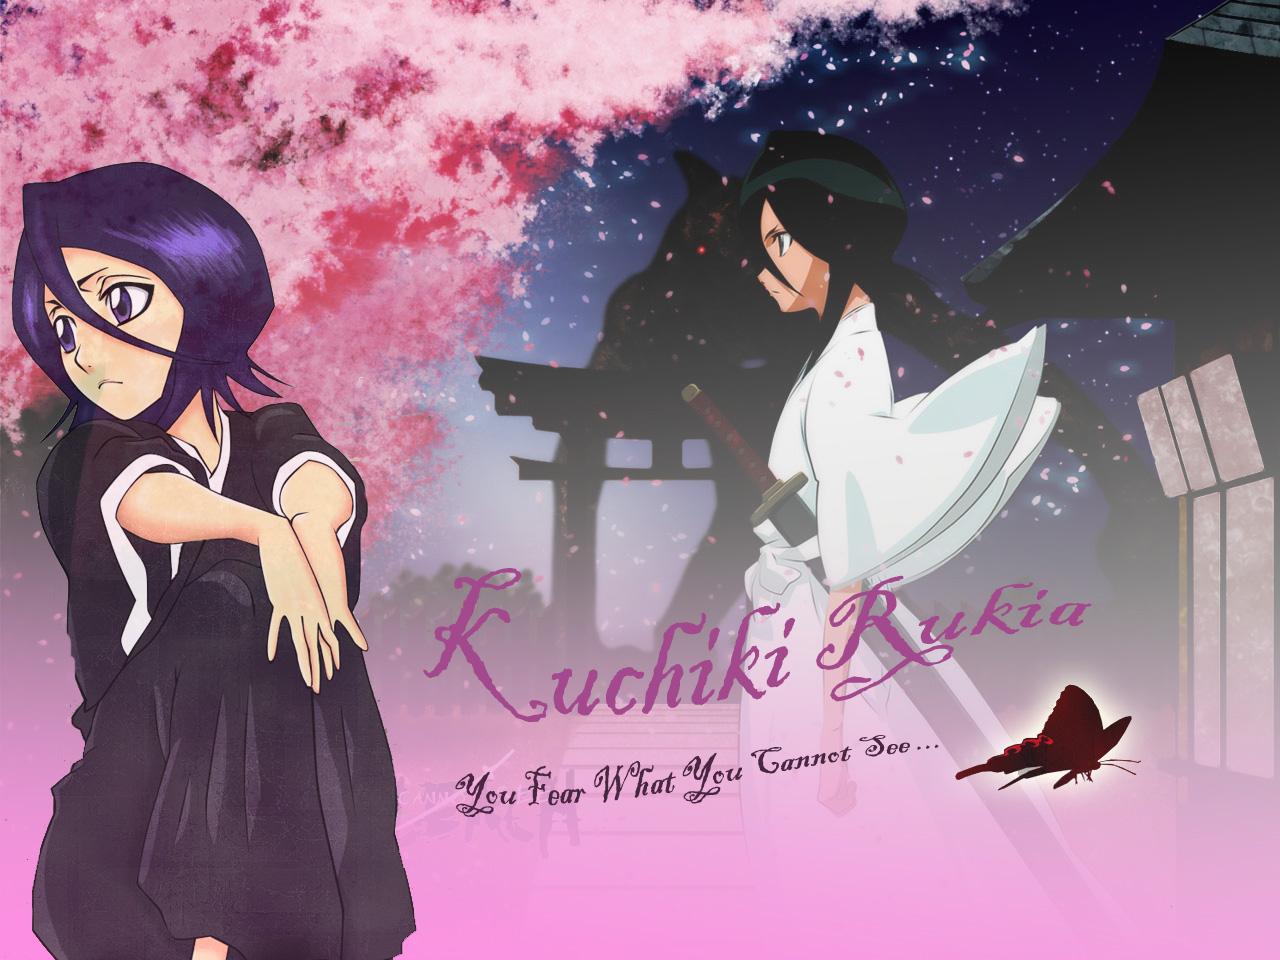 $',كوتشكي روكيا ,'$ Kuchiki_Rukia_Custom_Wallpaper_by_Immolated_angel